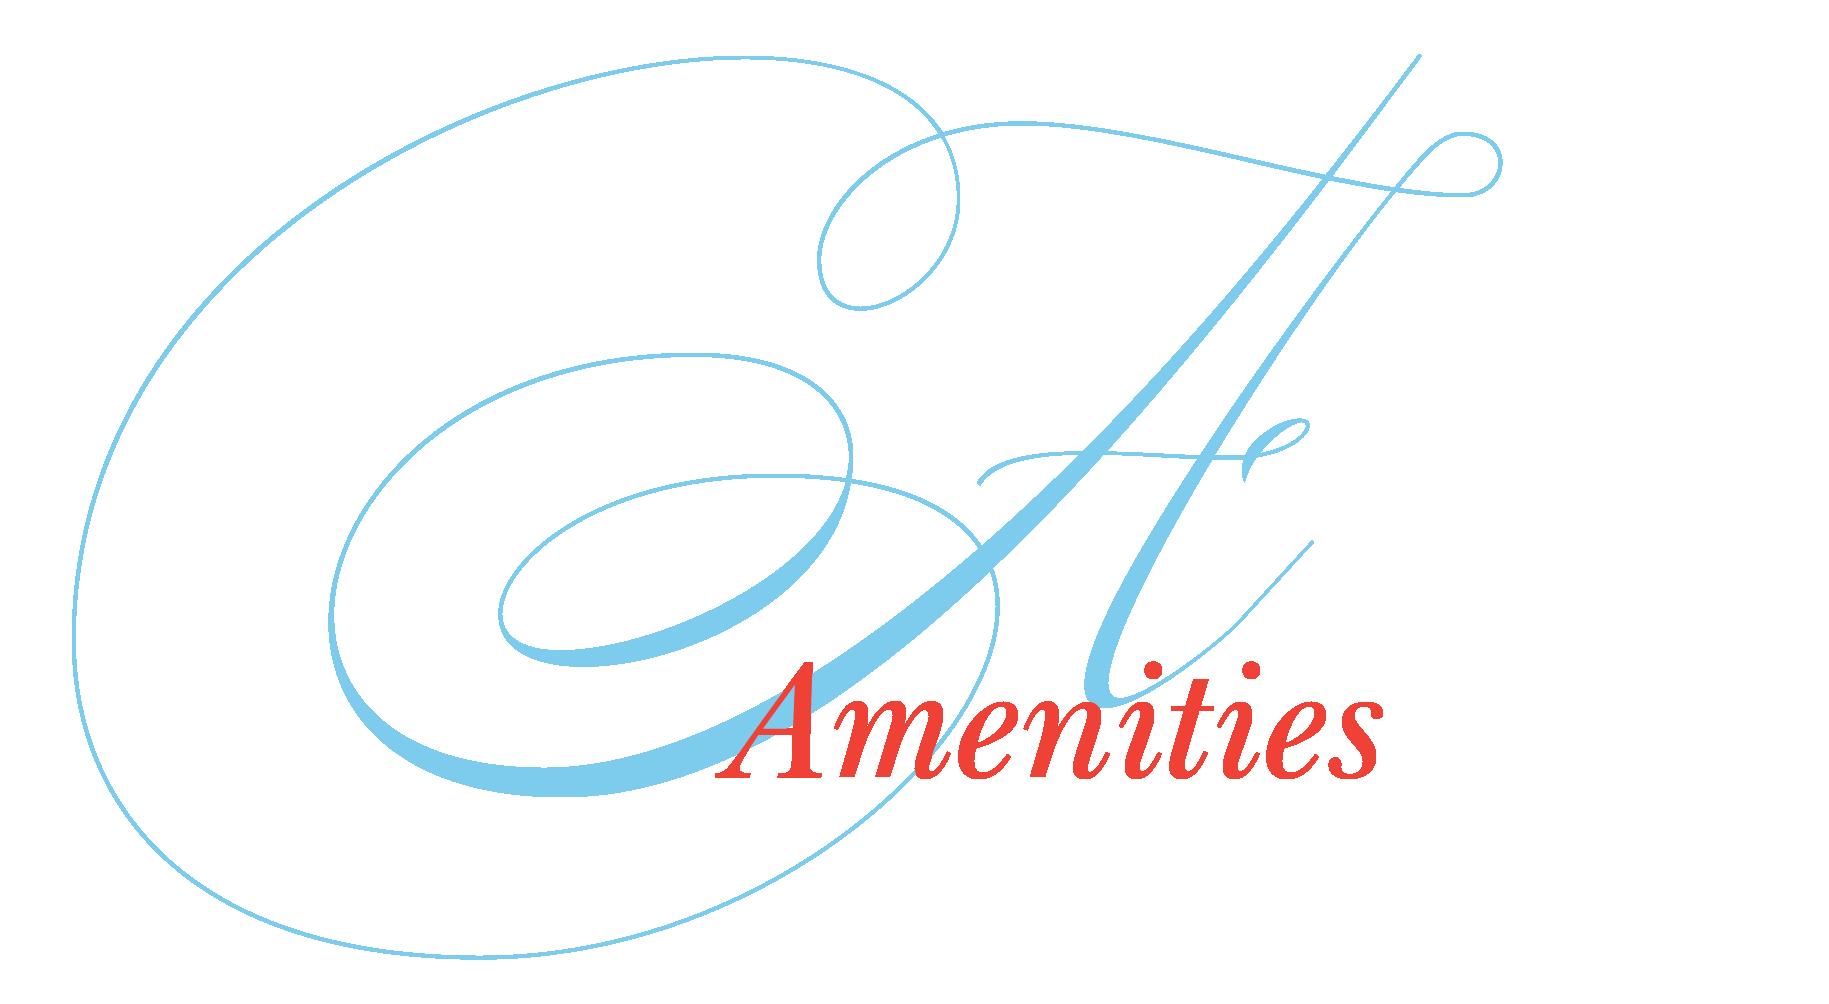 Amenities-04.png